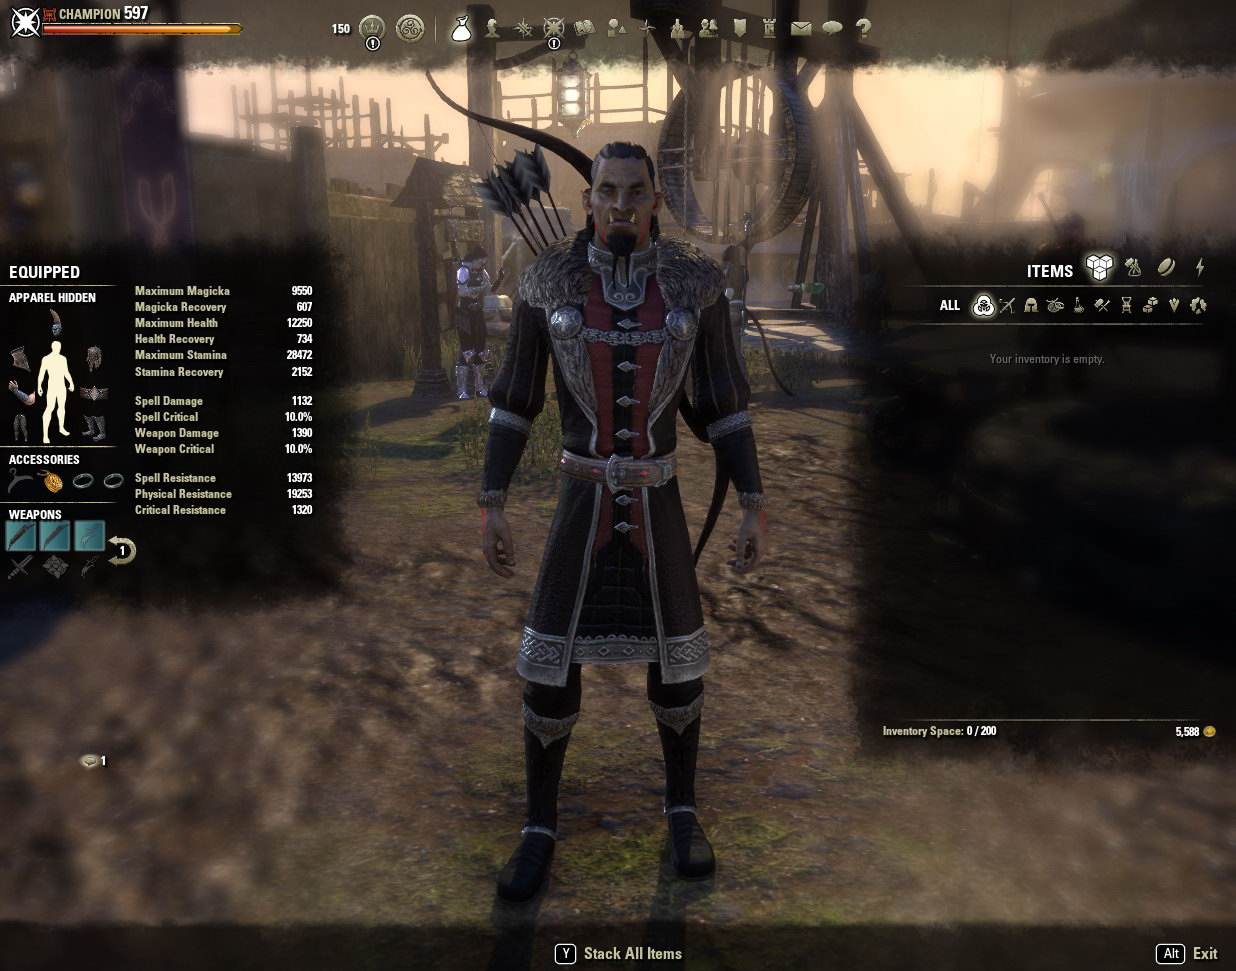 [PC-EU] 9 lvl 50. Nightblade-8, Sorcerer. 597 CP, MAX PROFESSIONS 5, MAX GUILDS 1.